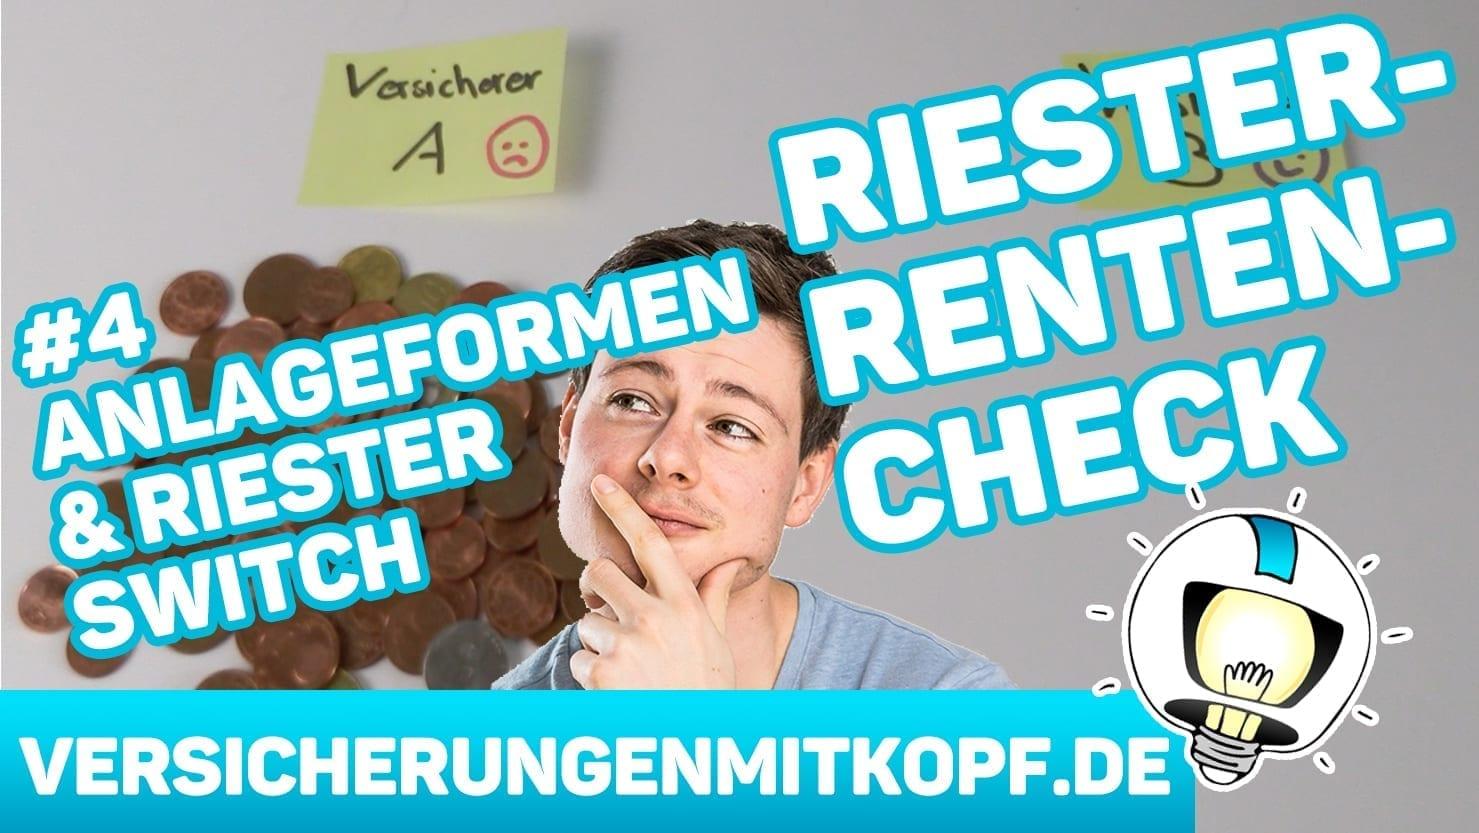 vmk thumbnail RR Teil4 ANLAGEFORMEN - Riester Renten Check Teil 4 – Anlageformen & Riester Switch